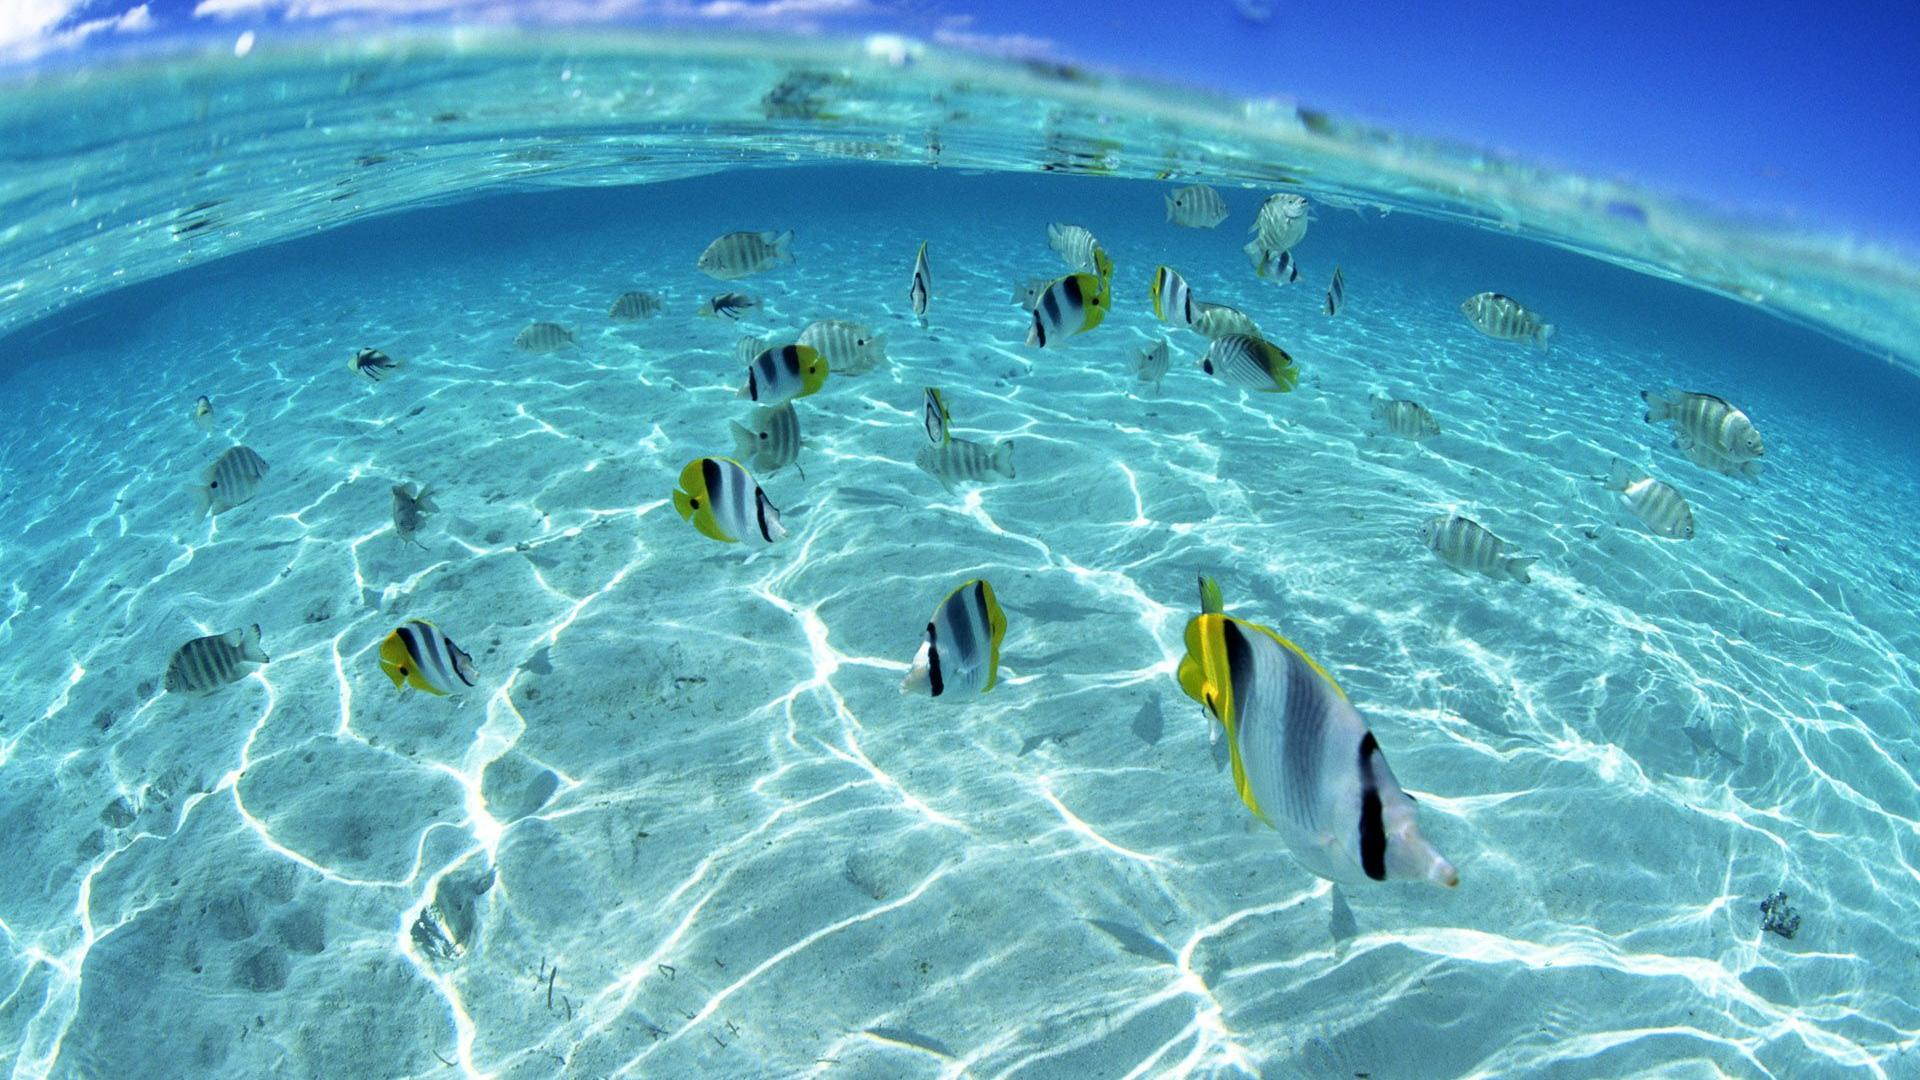 Underwater Fish Wallpaper Photos 2845 Wallpaper Cool Walldiskpaper 1920x1080